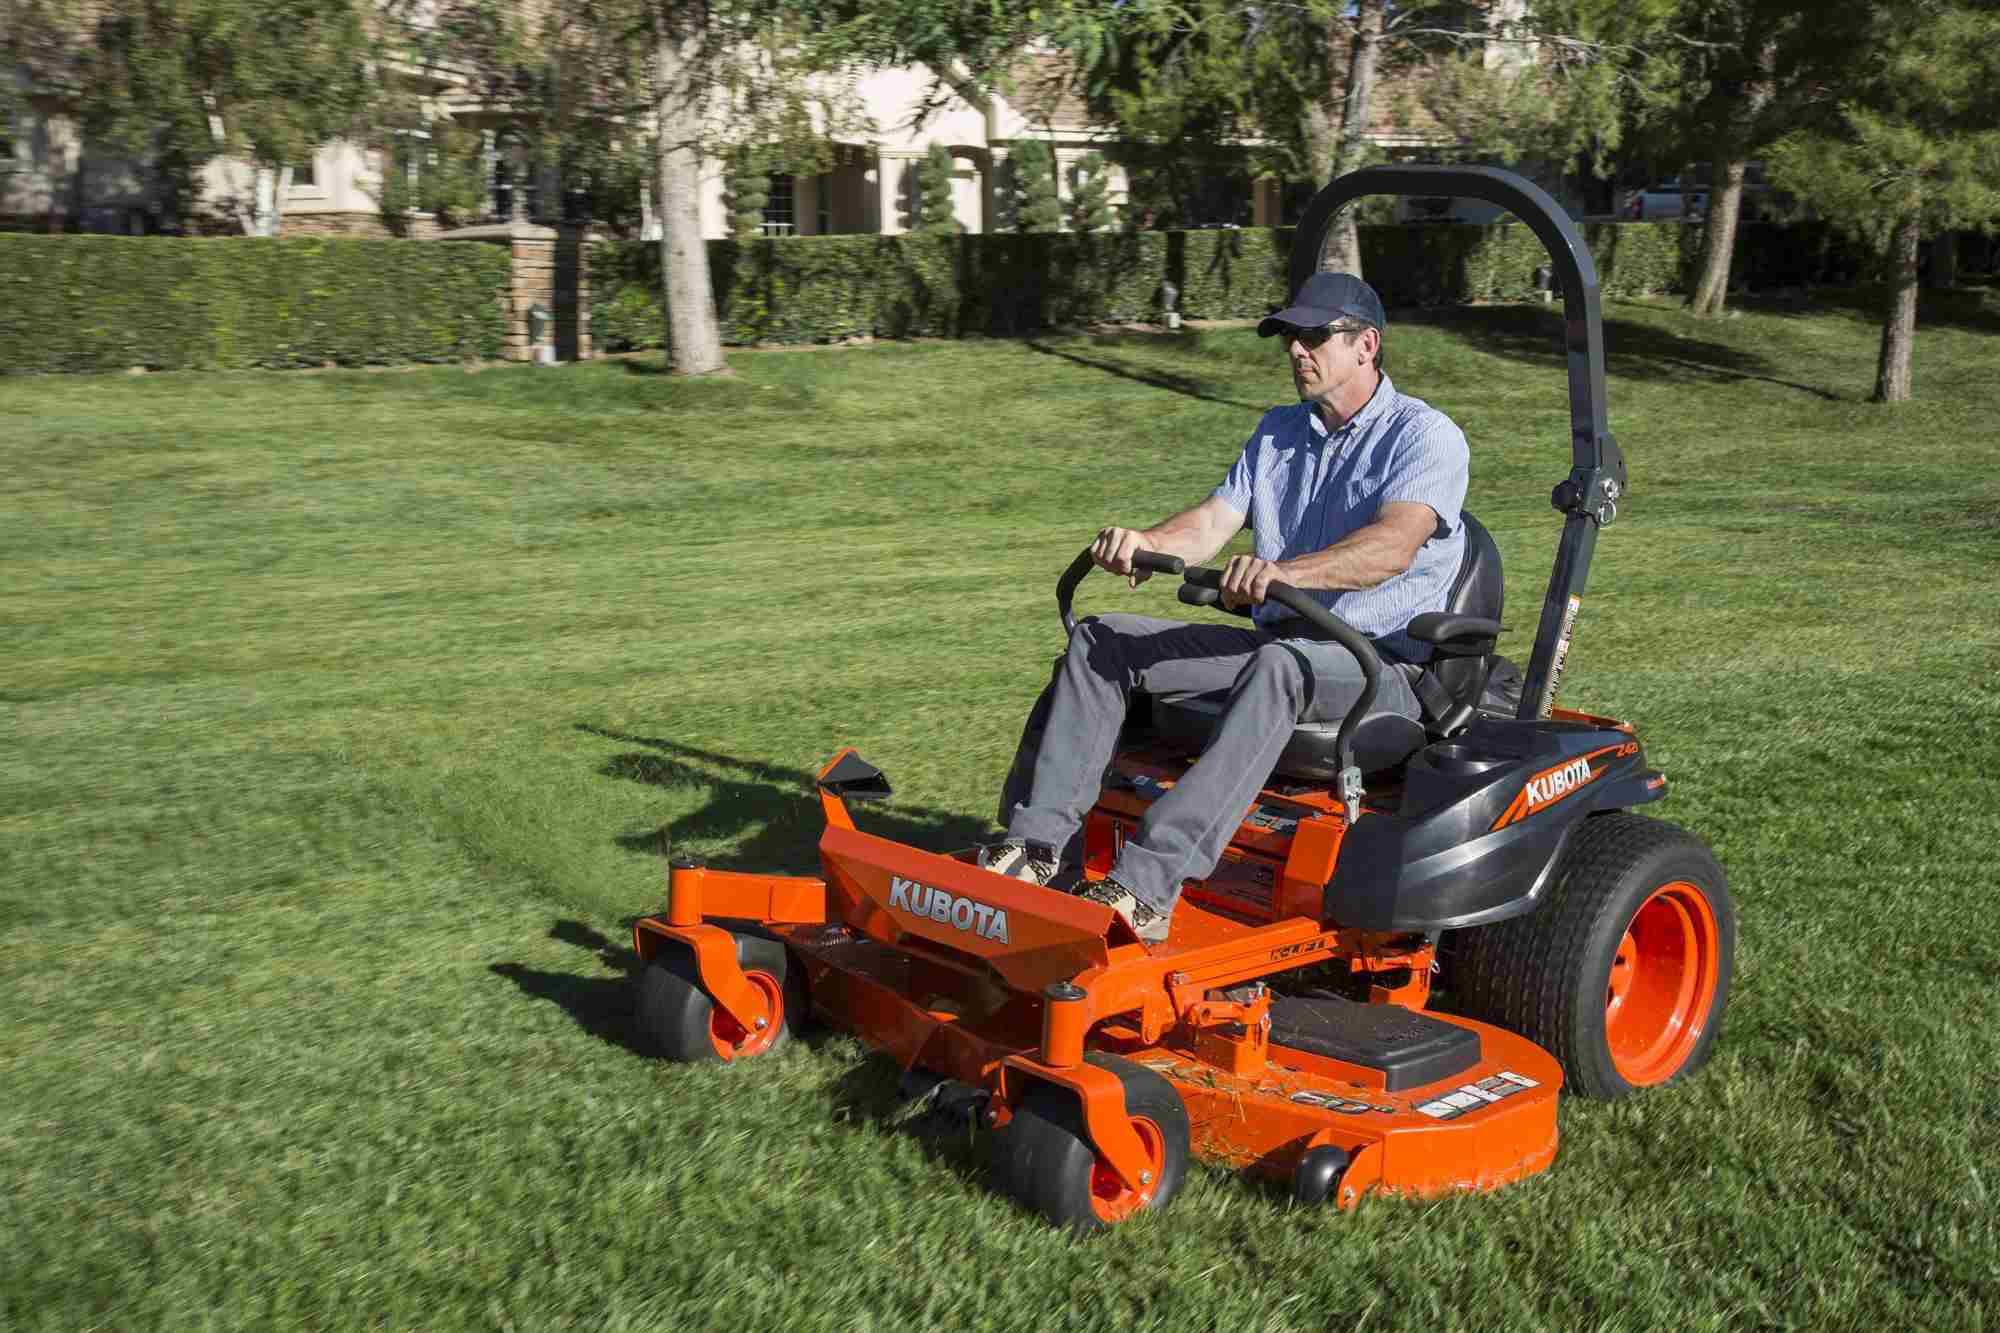 new kubota zero turn mowers roll out with speed  torque